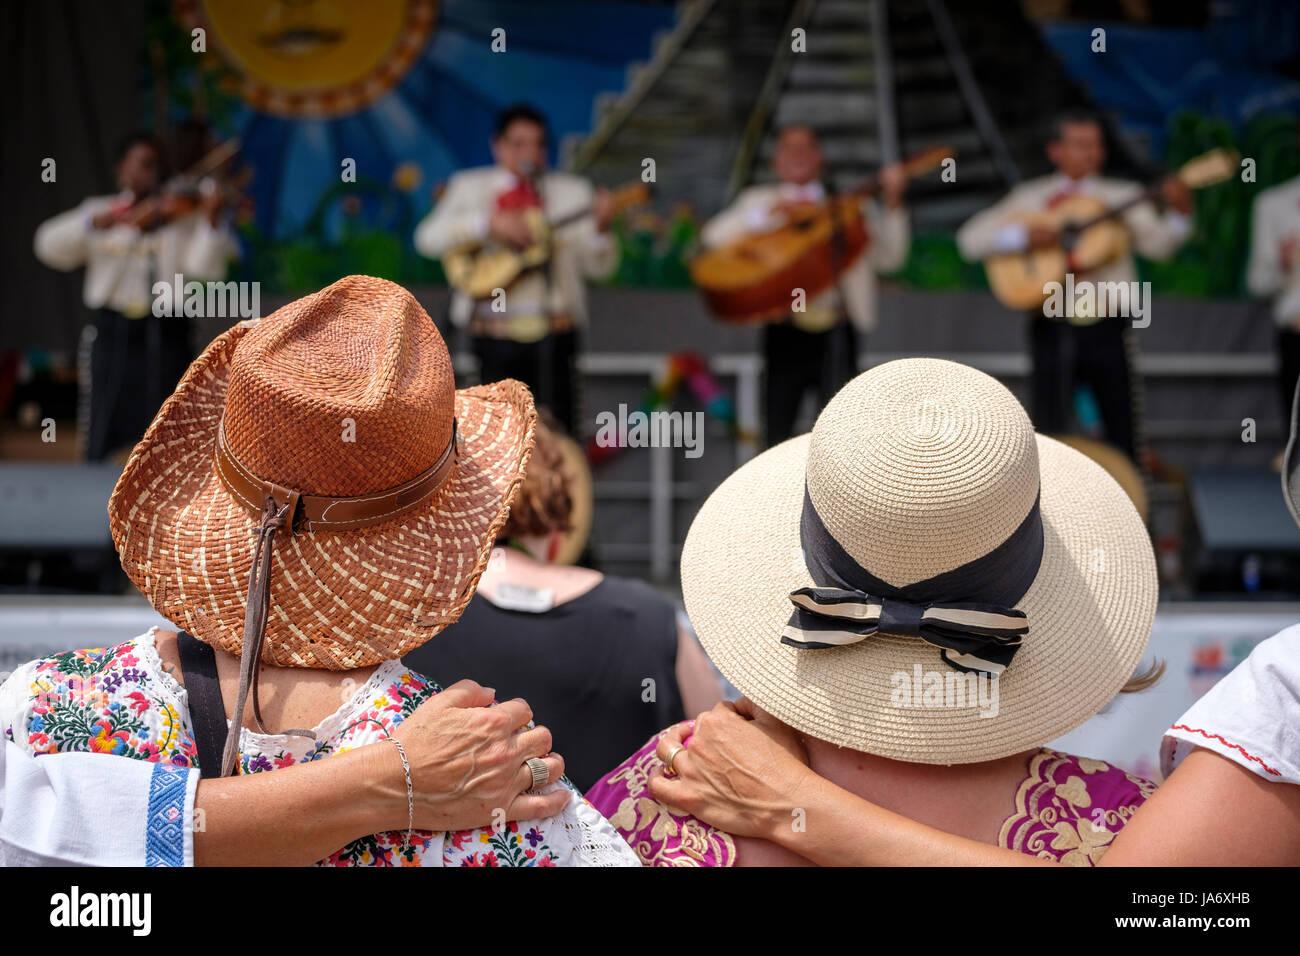 Mexico Straw Hats Mexican Imágenes De Stock   Mexico Straw Hats ... 96e4ba94742